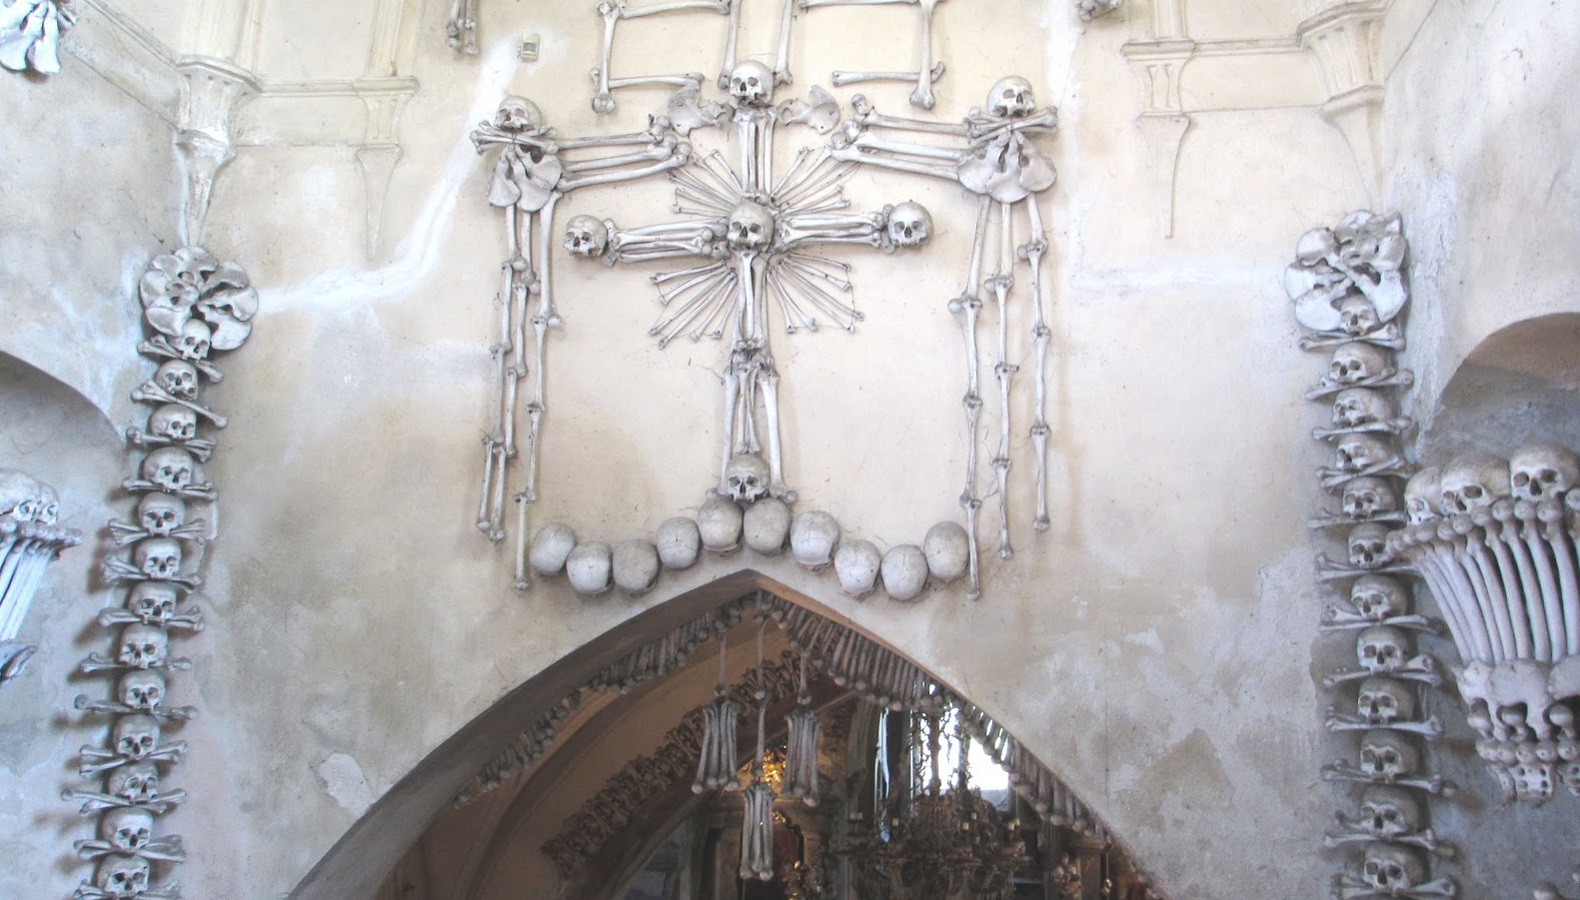 Sedlec Ossuary in Czech Republic